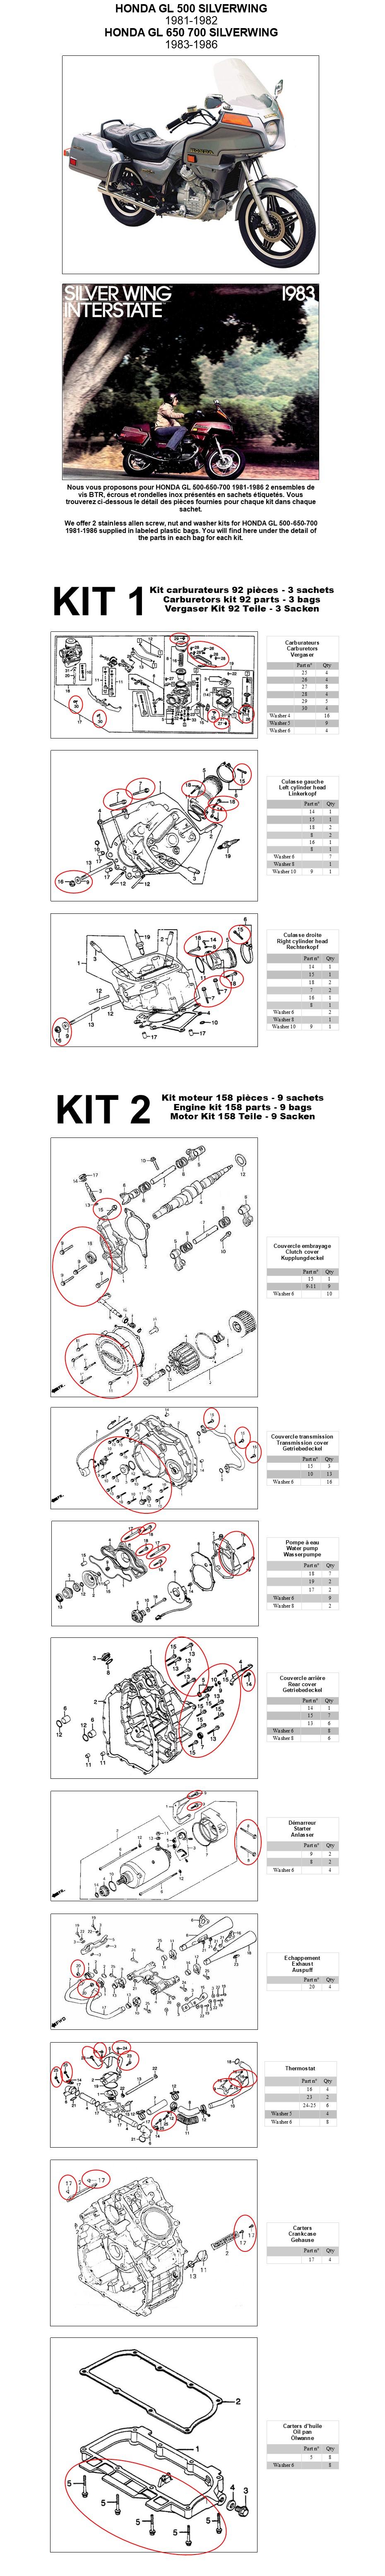 Carburetor Honda XR200R 1981 1982 1983 1986-1991 1992-1997  XR 200R Carb